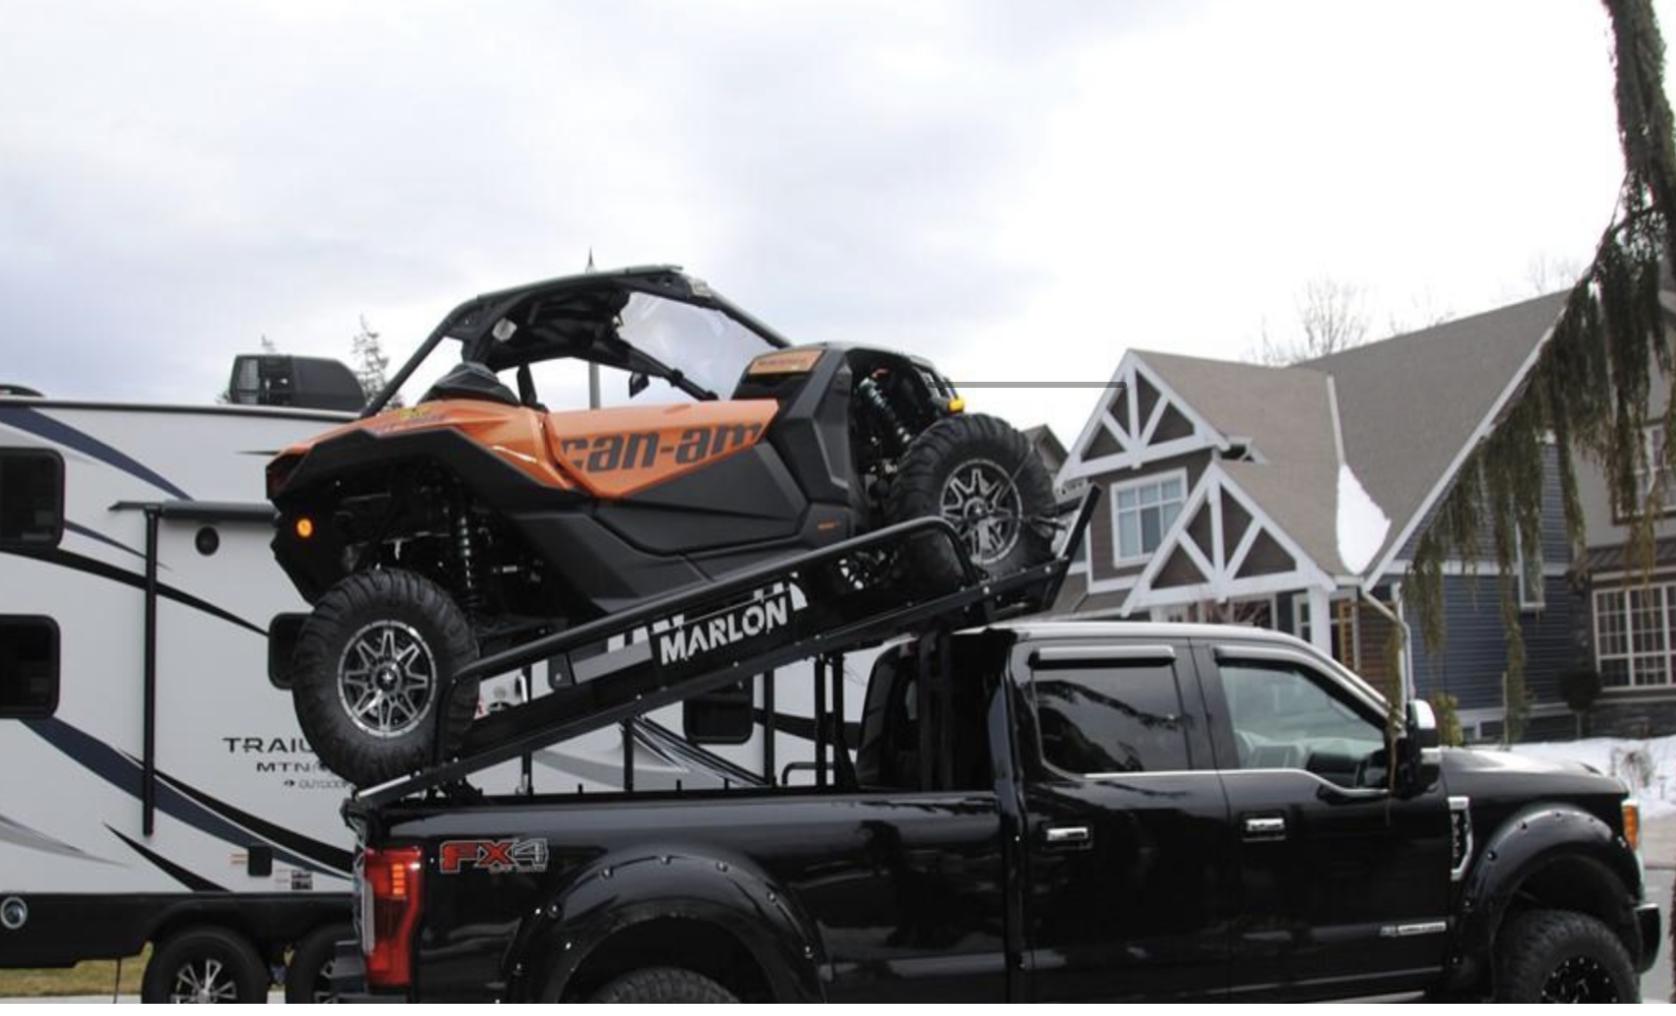 To transport your vehicules: Marlon – Xplore II SxS Truck Deck